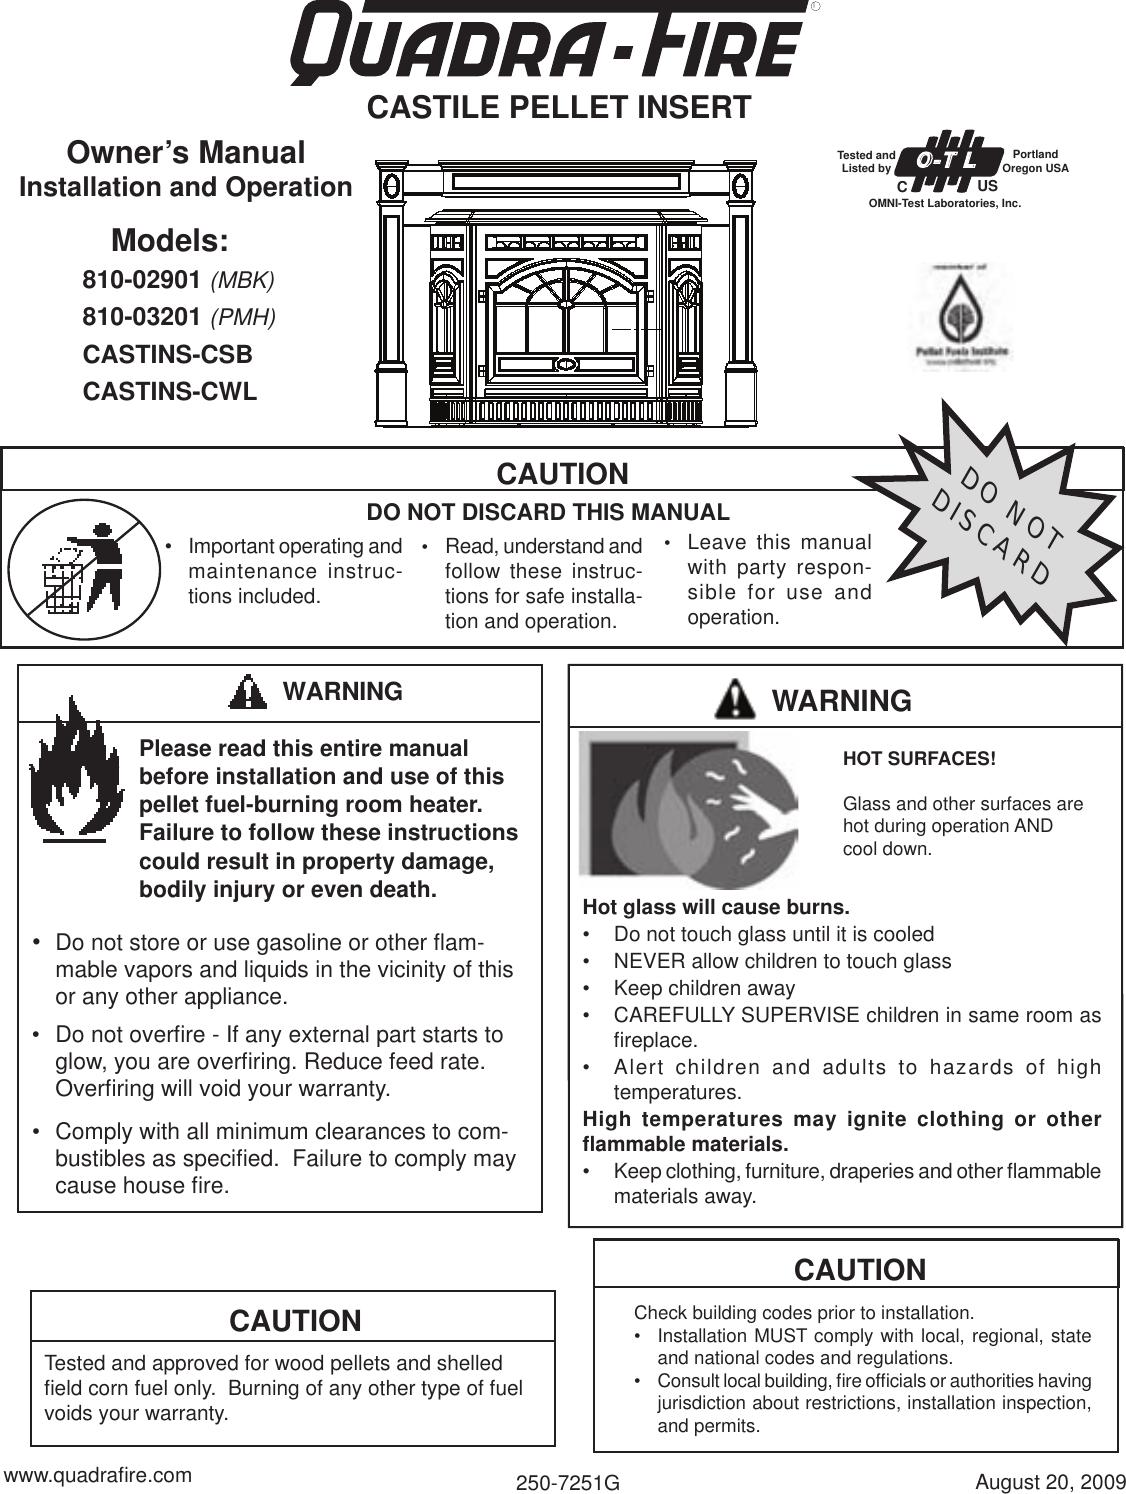 Quadra Fire 810 02901 Users Manual 250 7251G Castile Pellet ... on